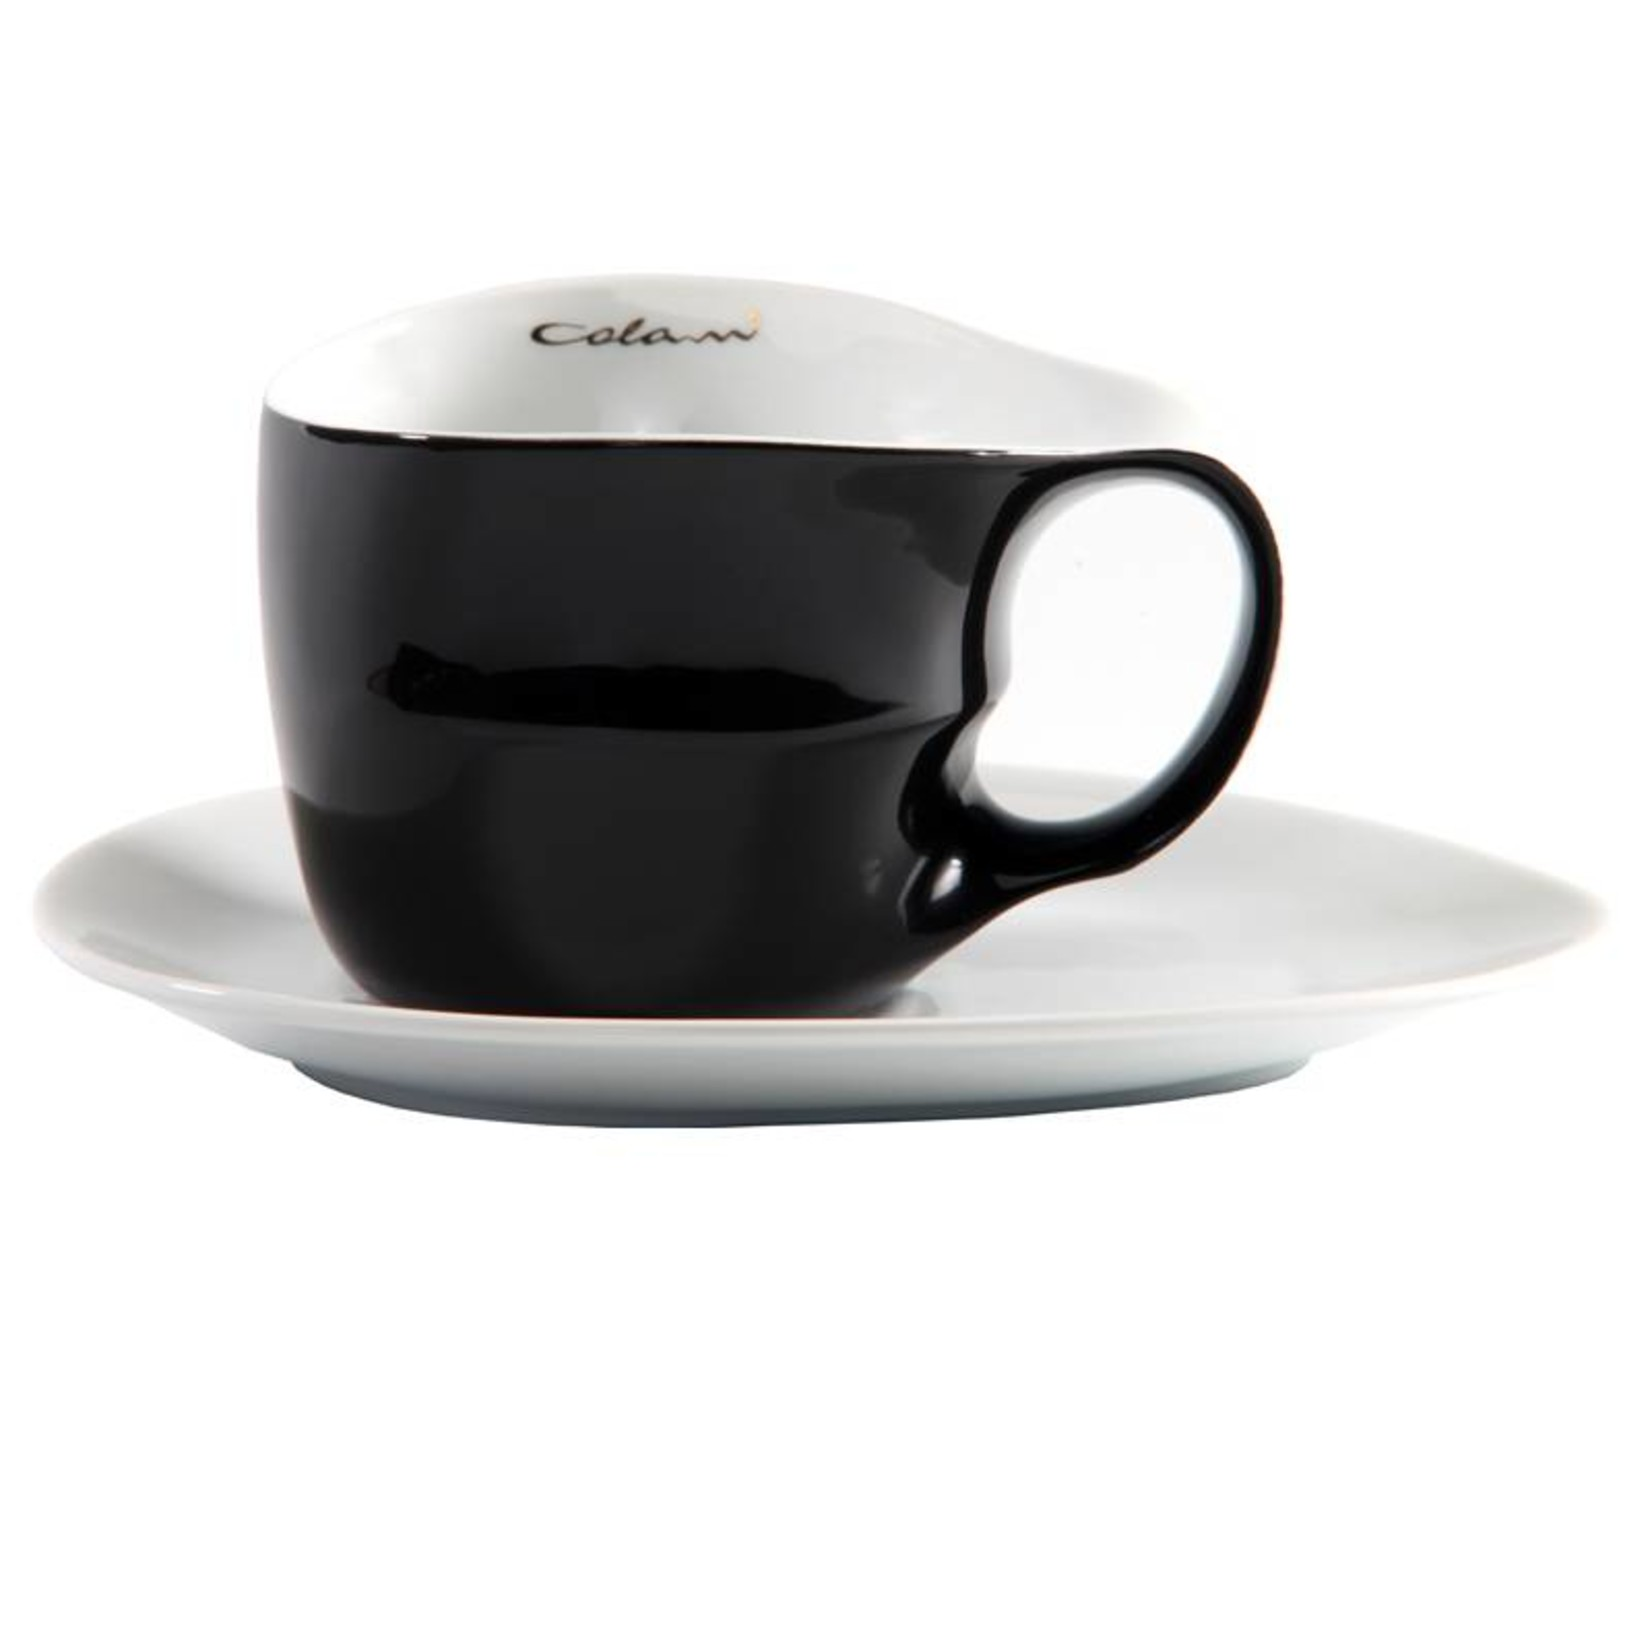 Colani Porzellanserie Colani Jumbotasse | Tasse inkl. Unterteller | schwarz